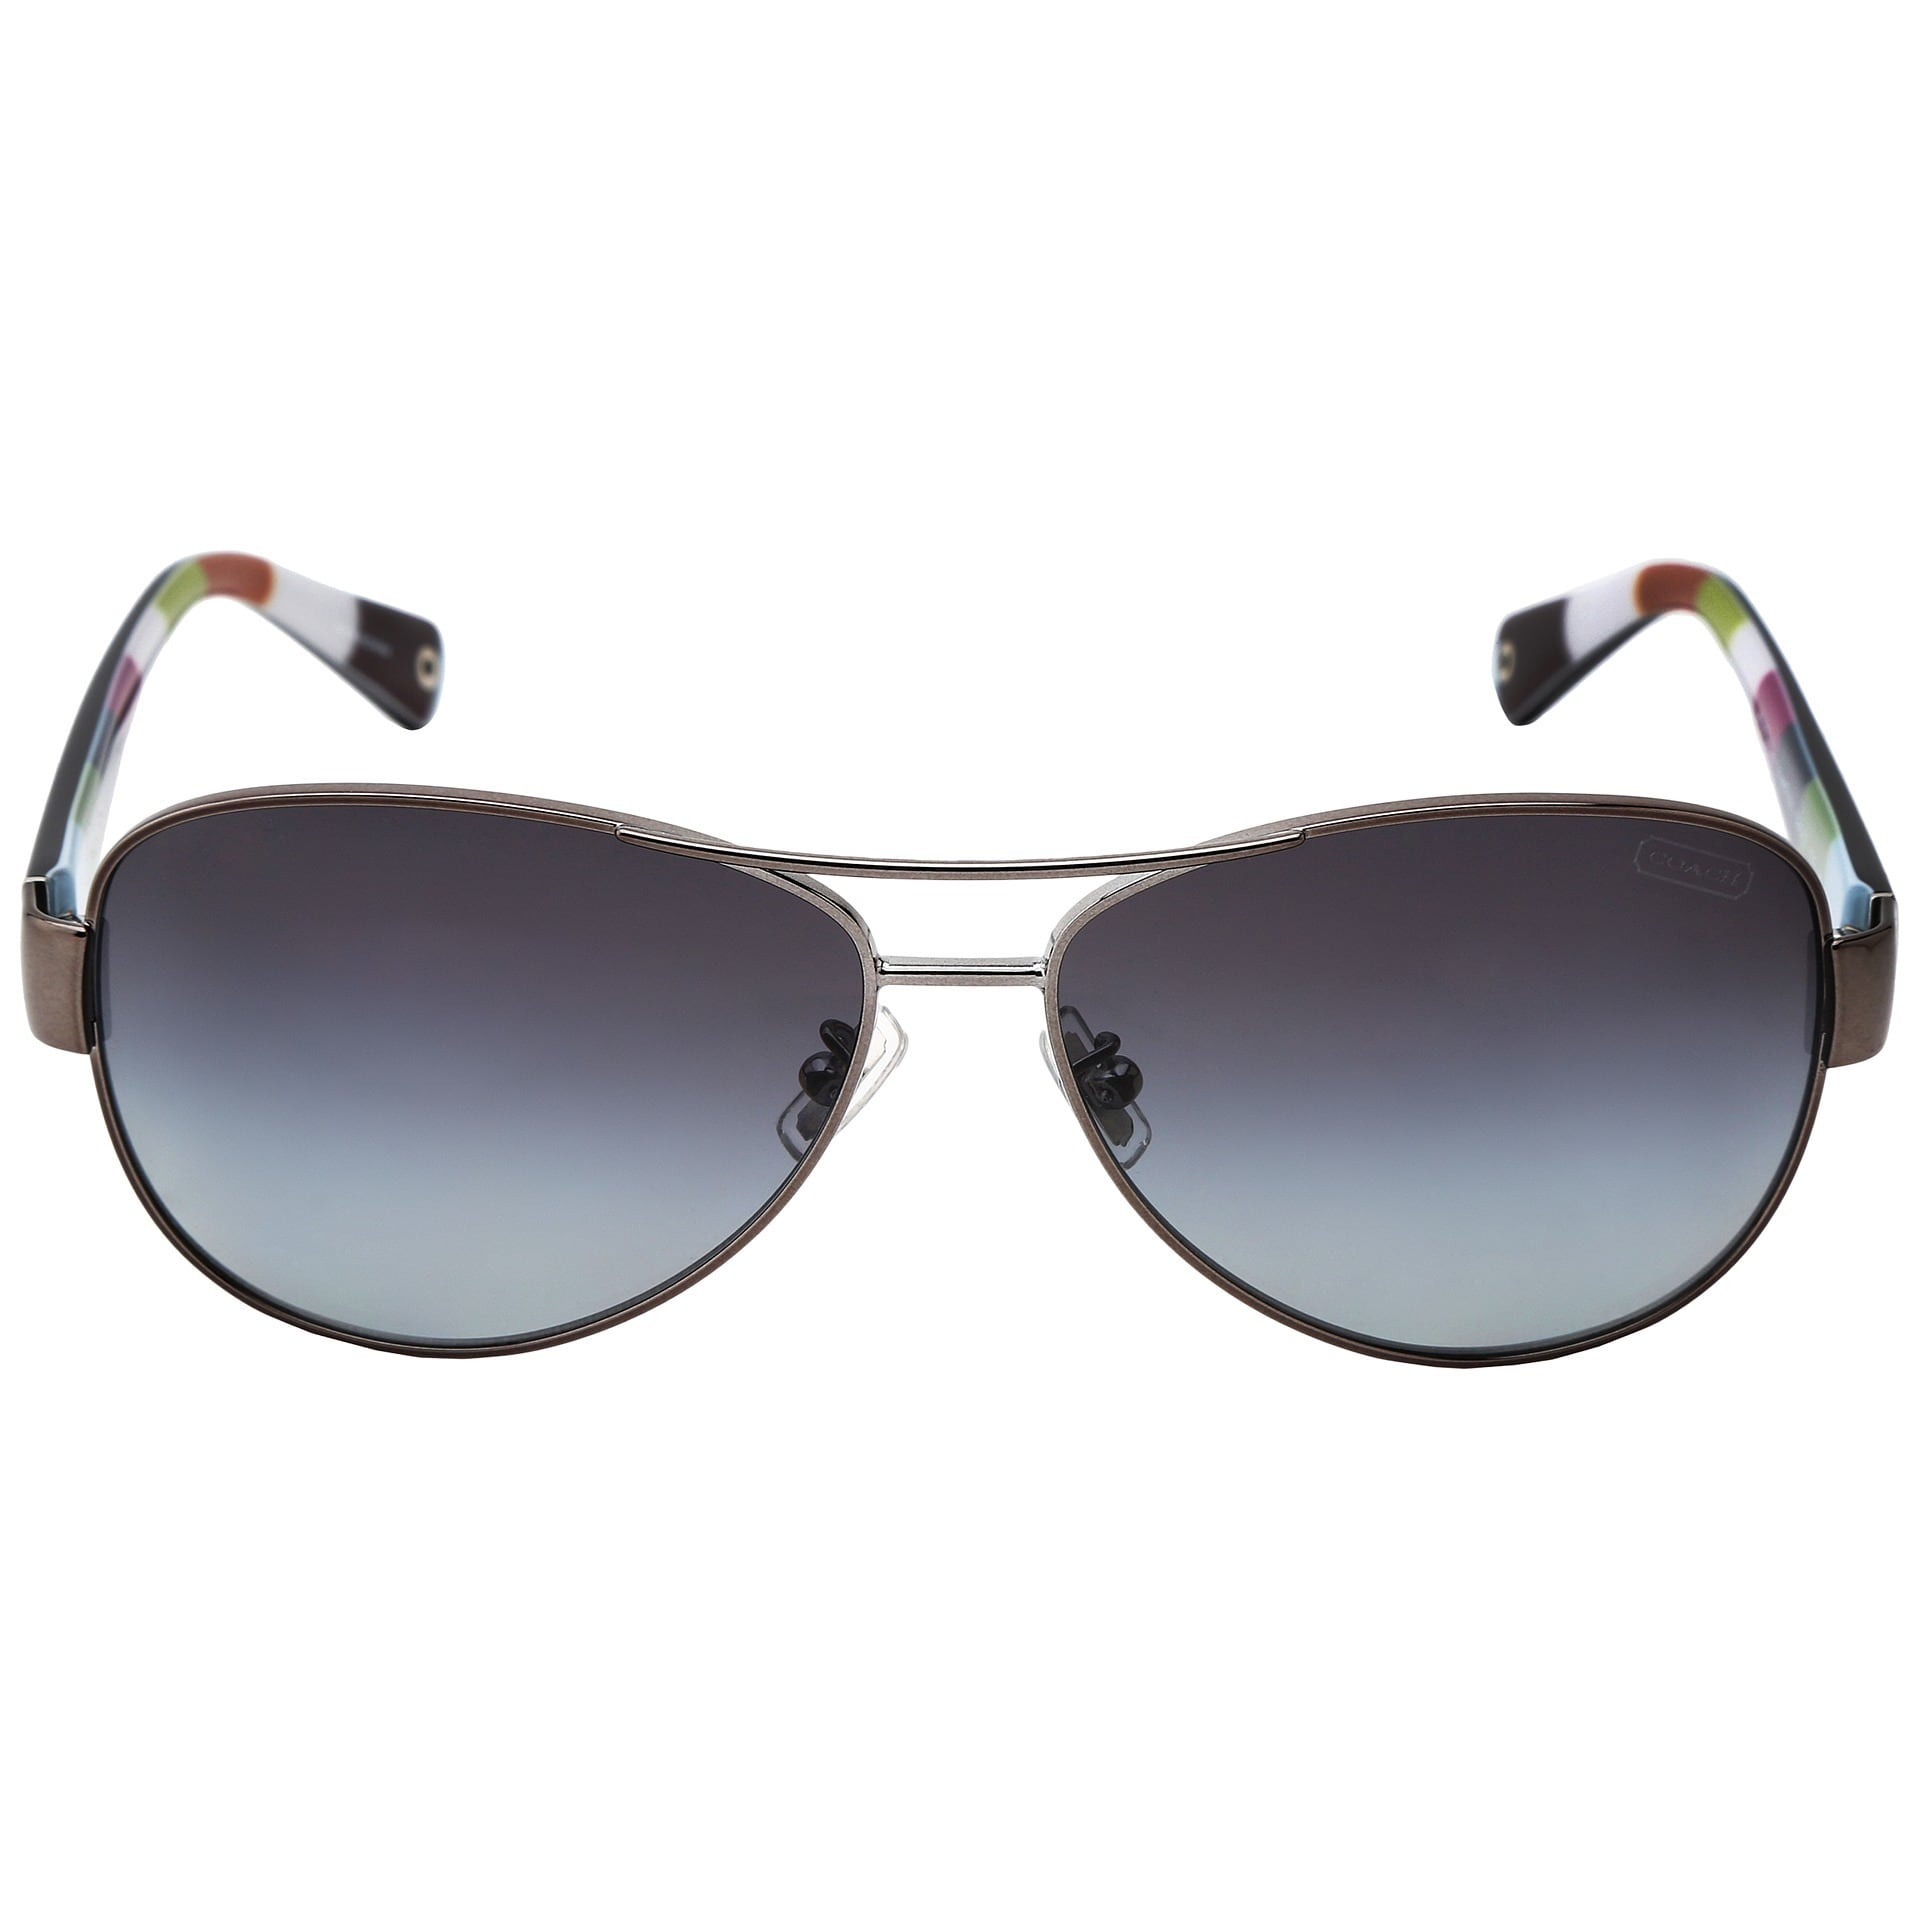 71130b382d Shop Coach Women s  L012 Kristina HC7003  9010T3 Metal Aviator Polarized  Sunglasses - Free Shipping Today - Overstock - 9394202